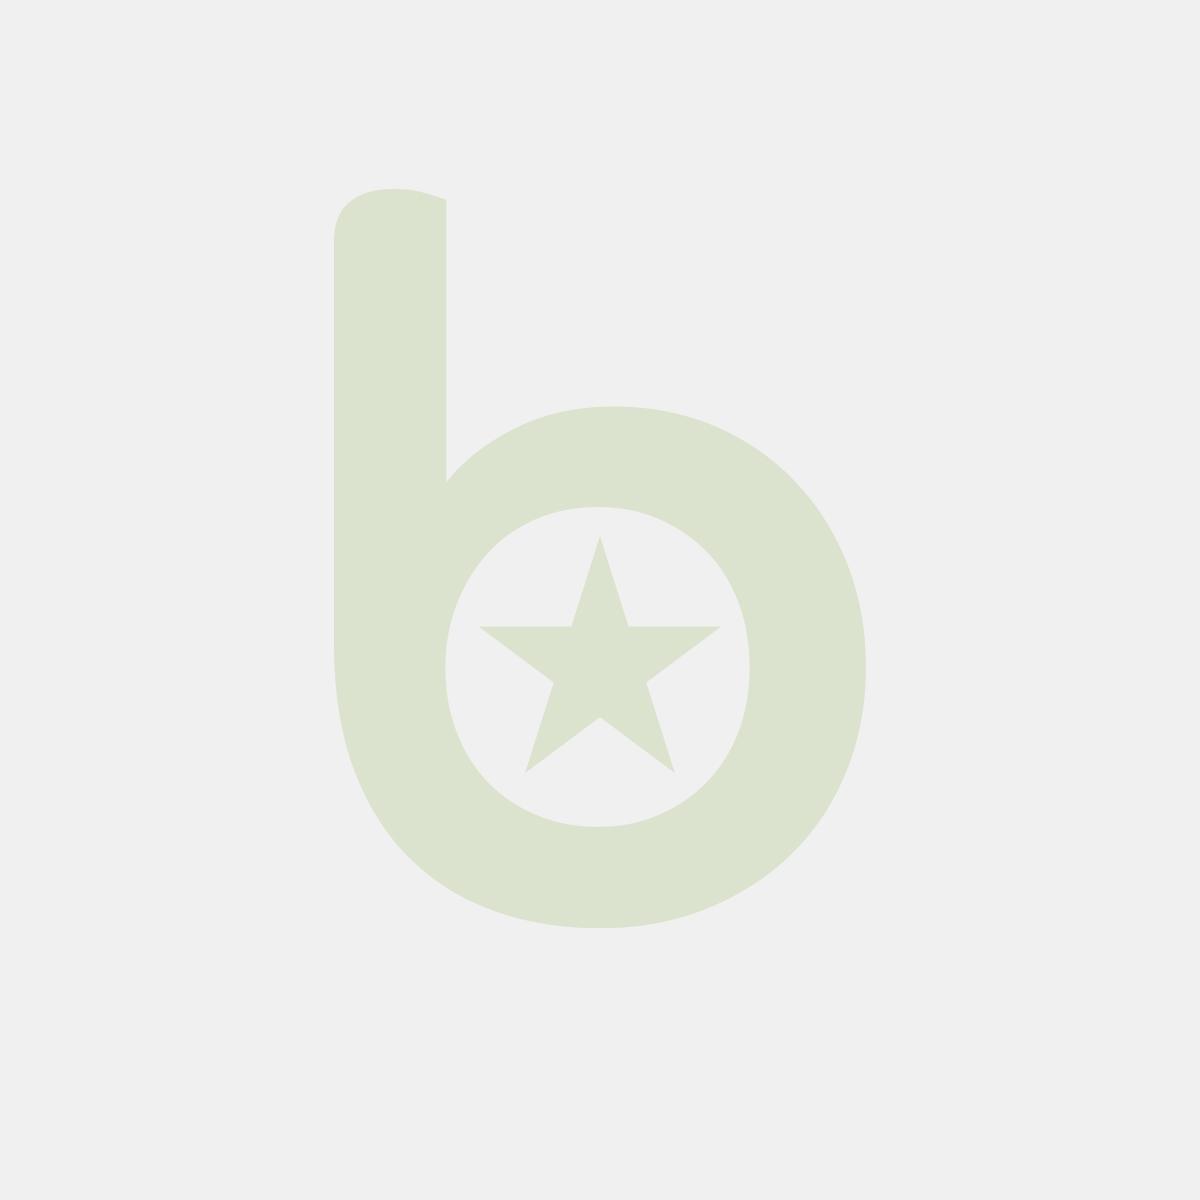 Antyrama DONAU, pleksi, 150x200mm